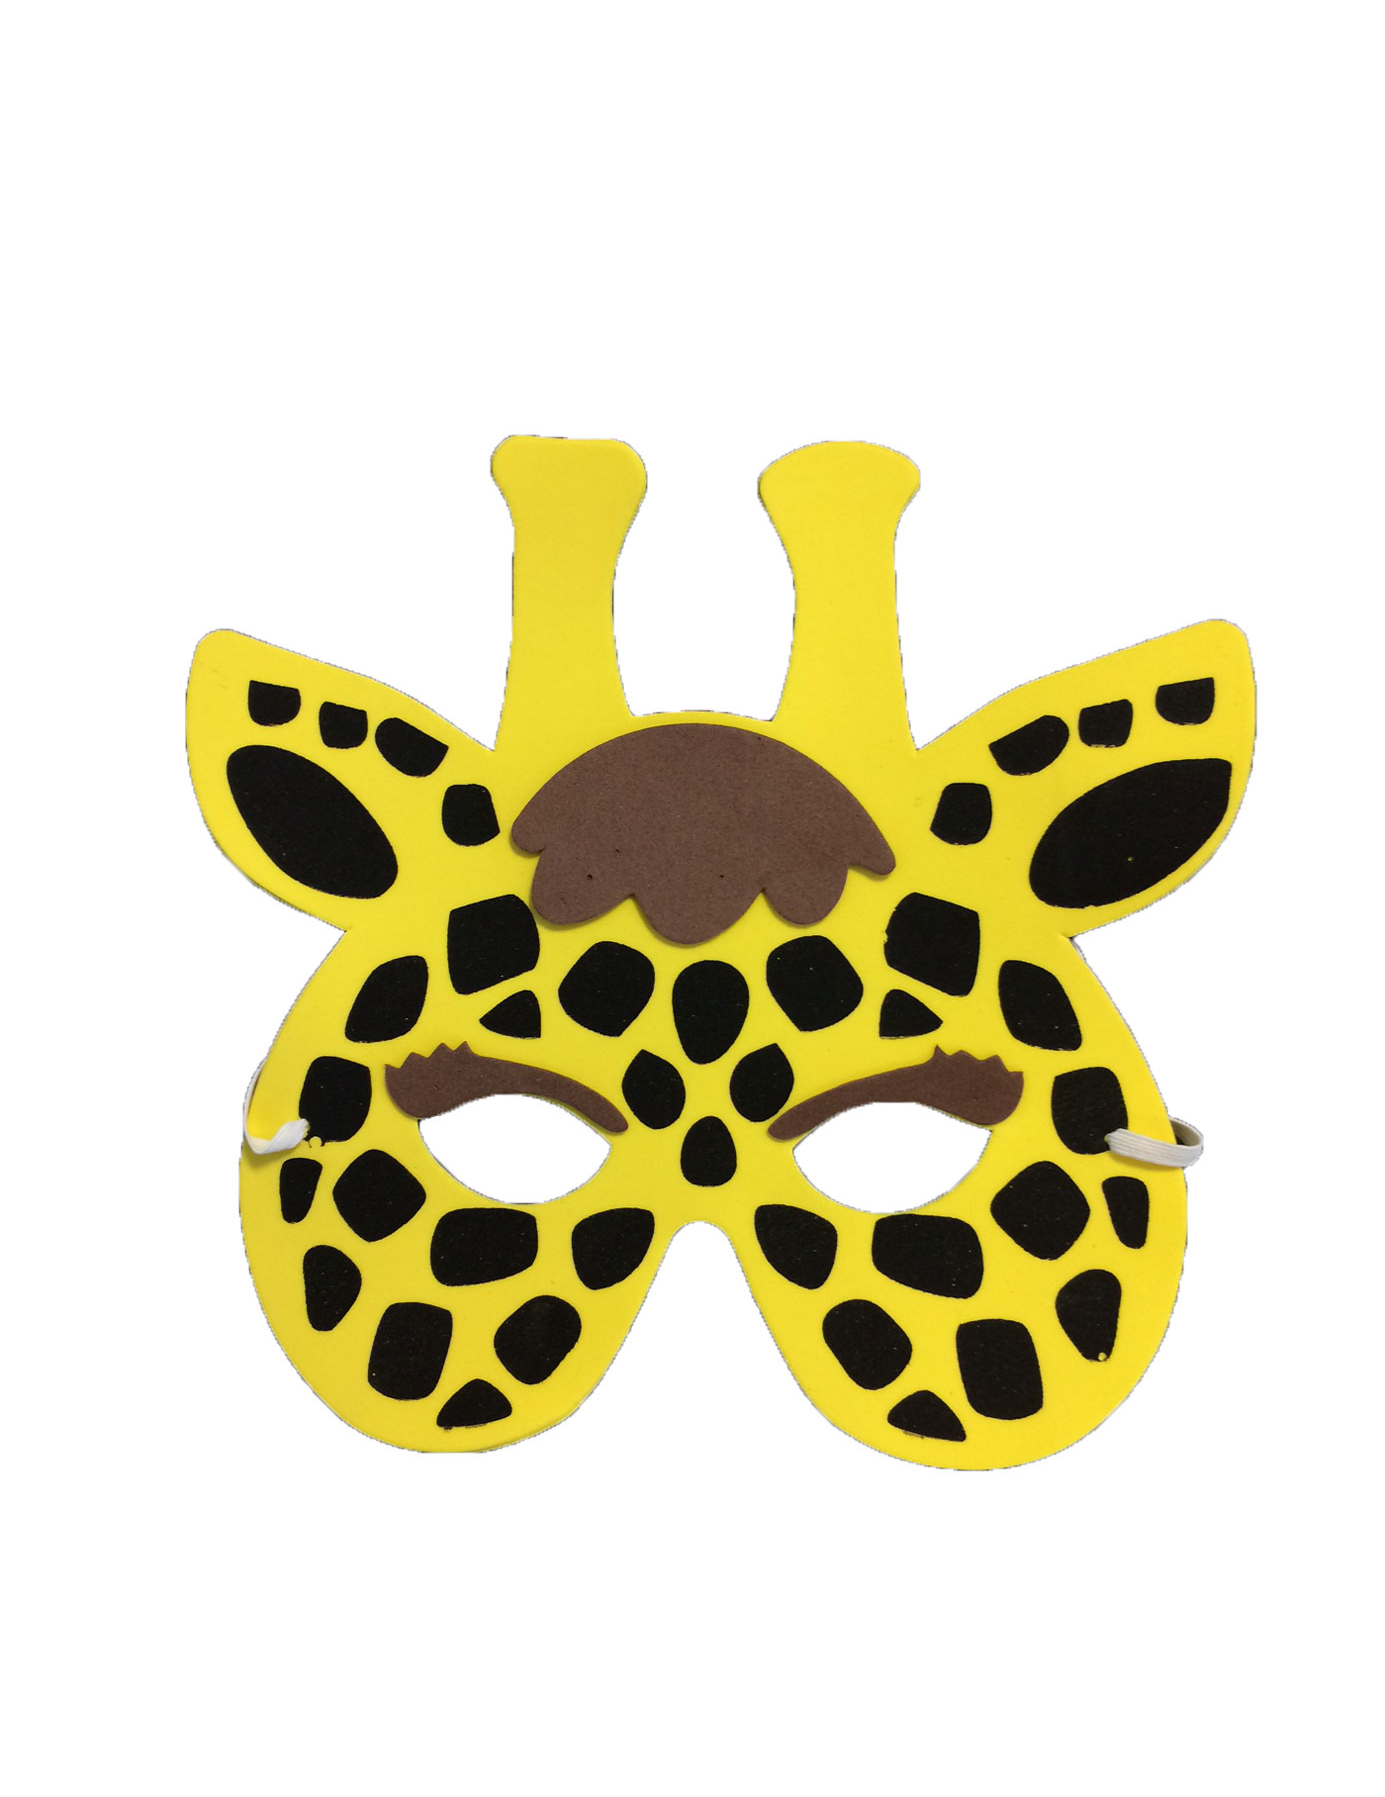 Mascara jirafa para imprimir - Imagui